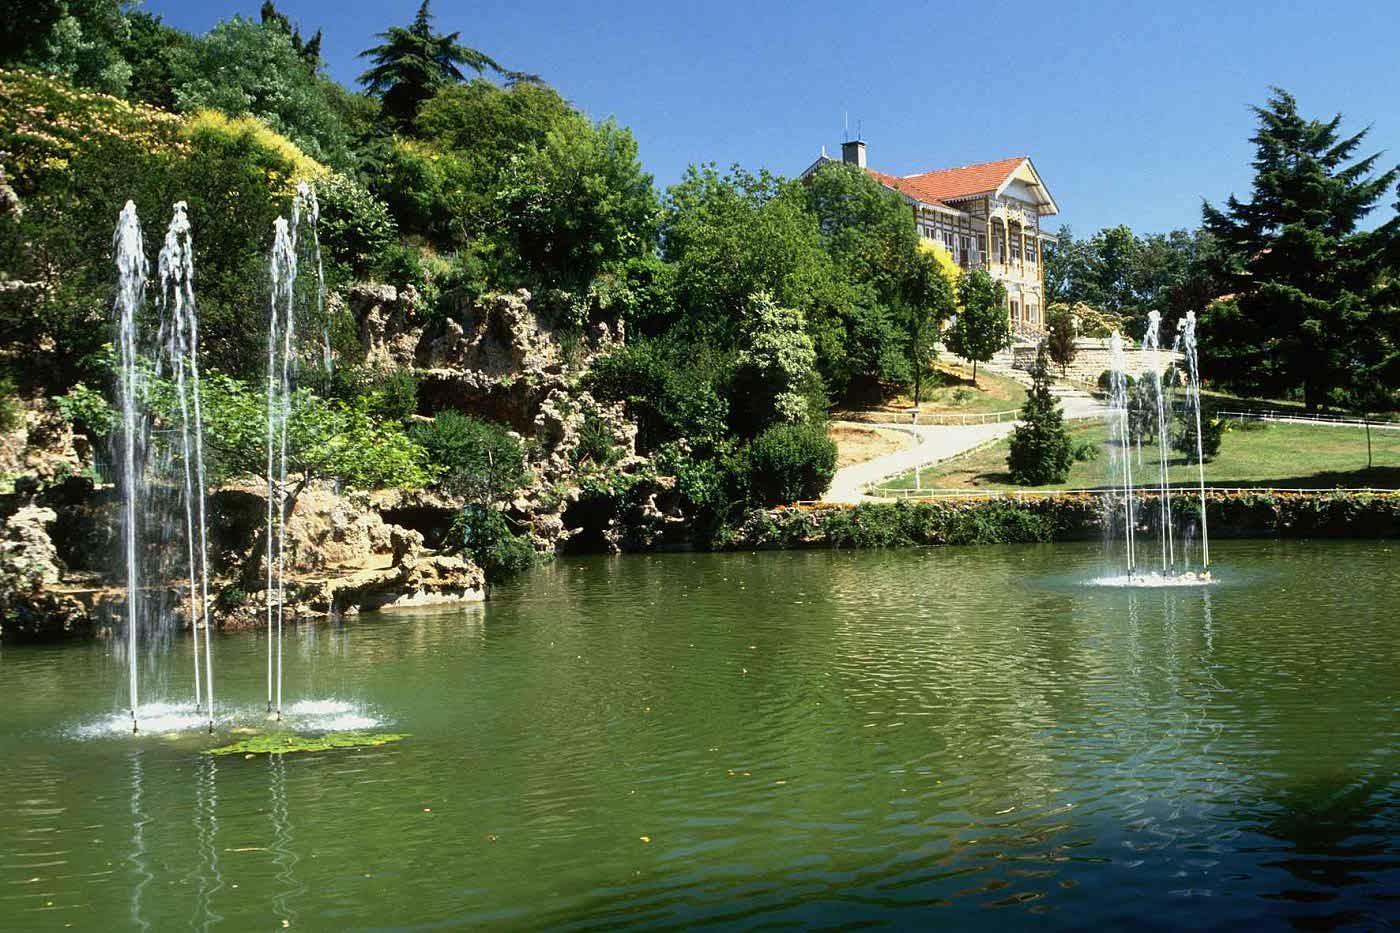 پارک ییلدیز استانبول